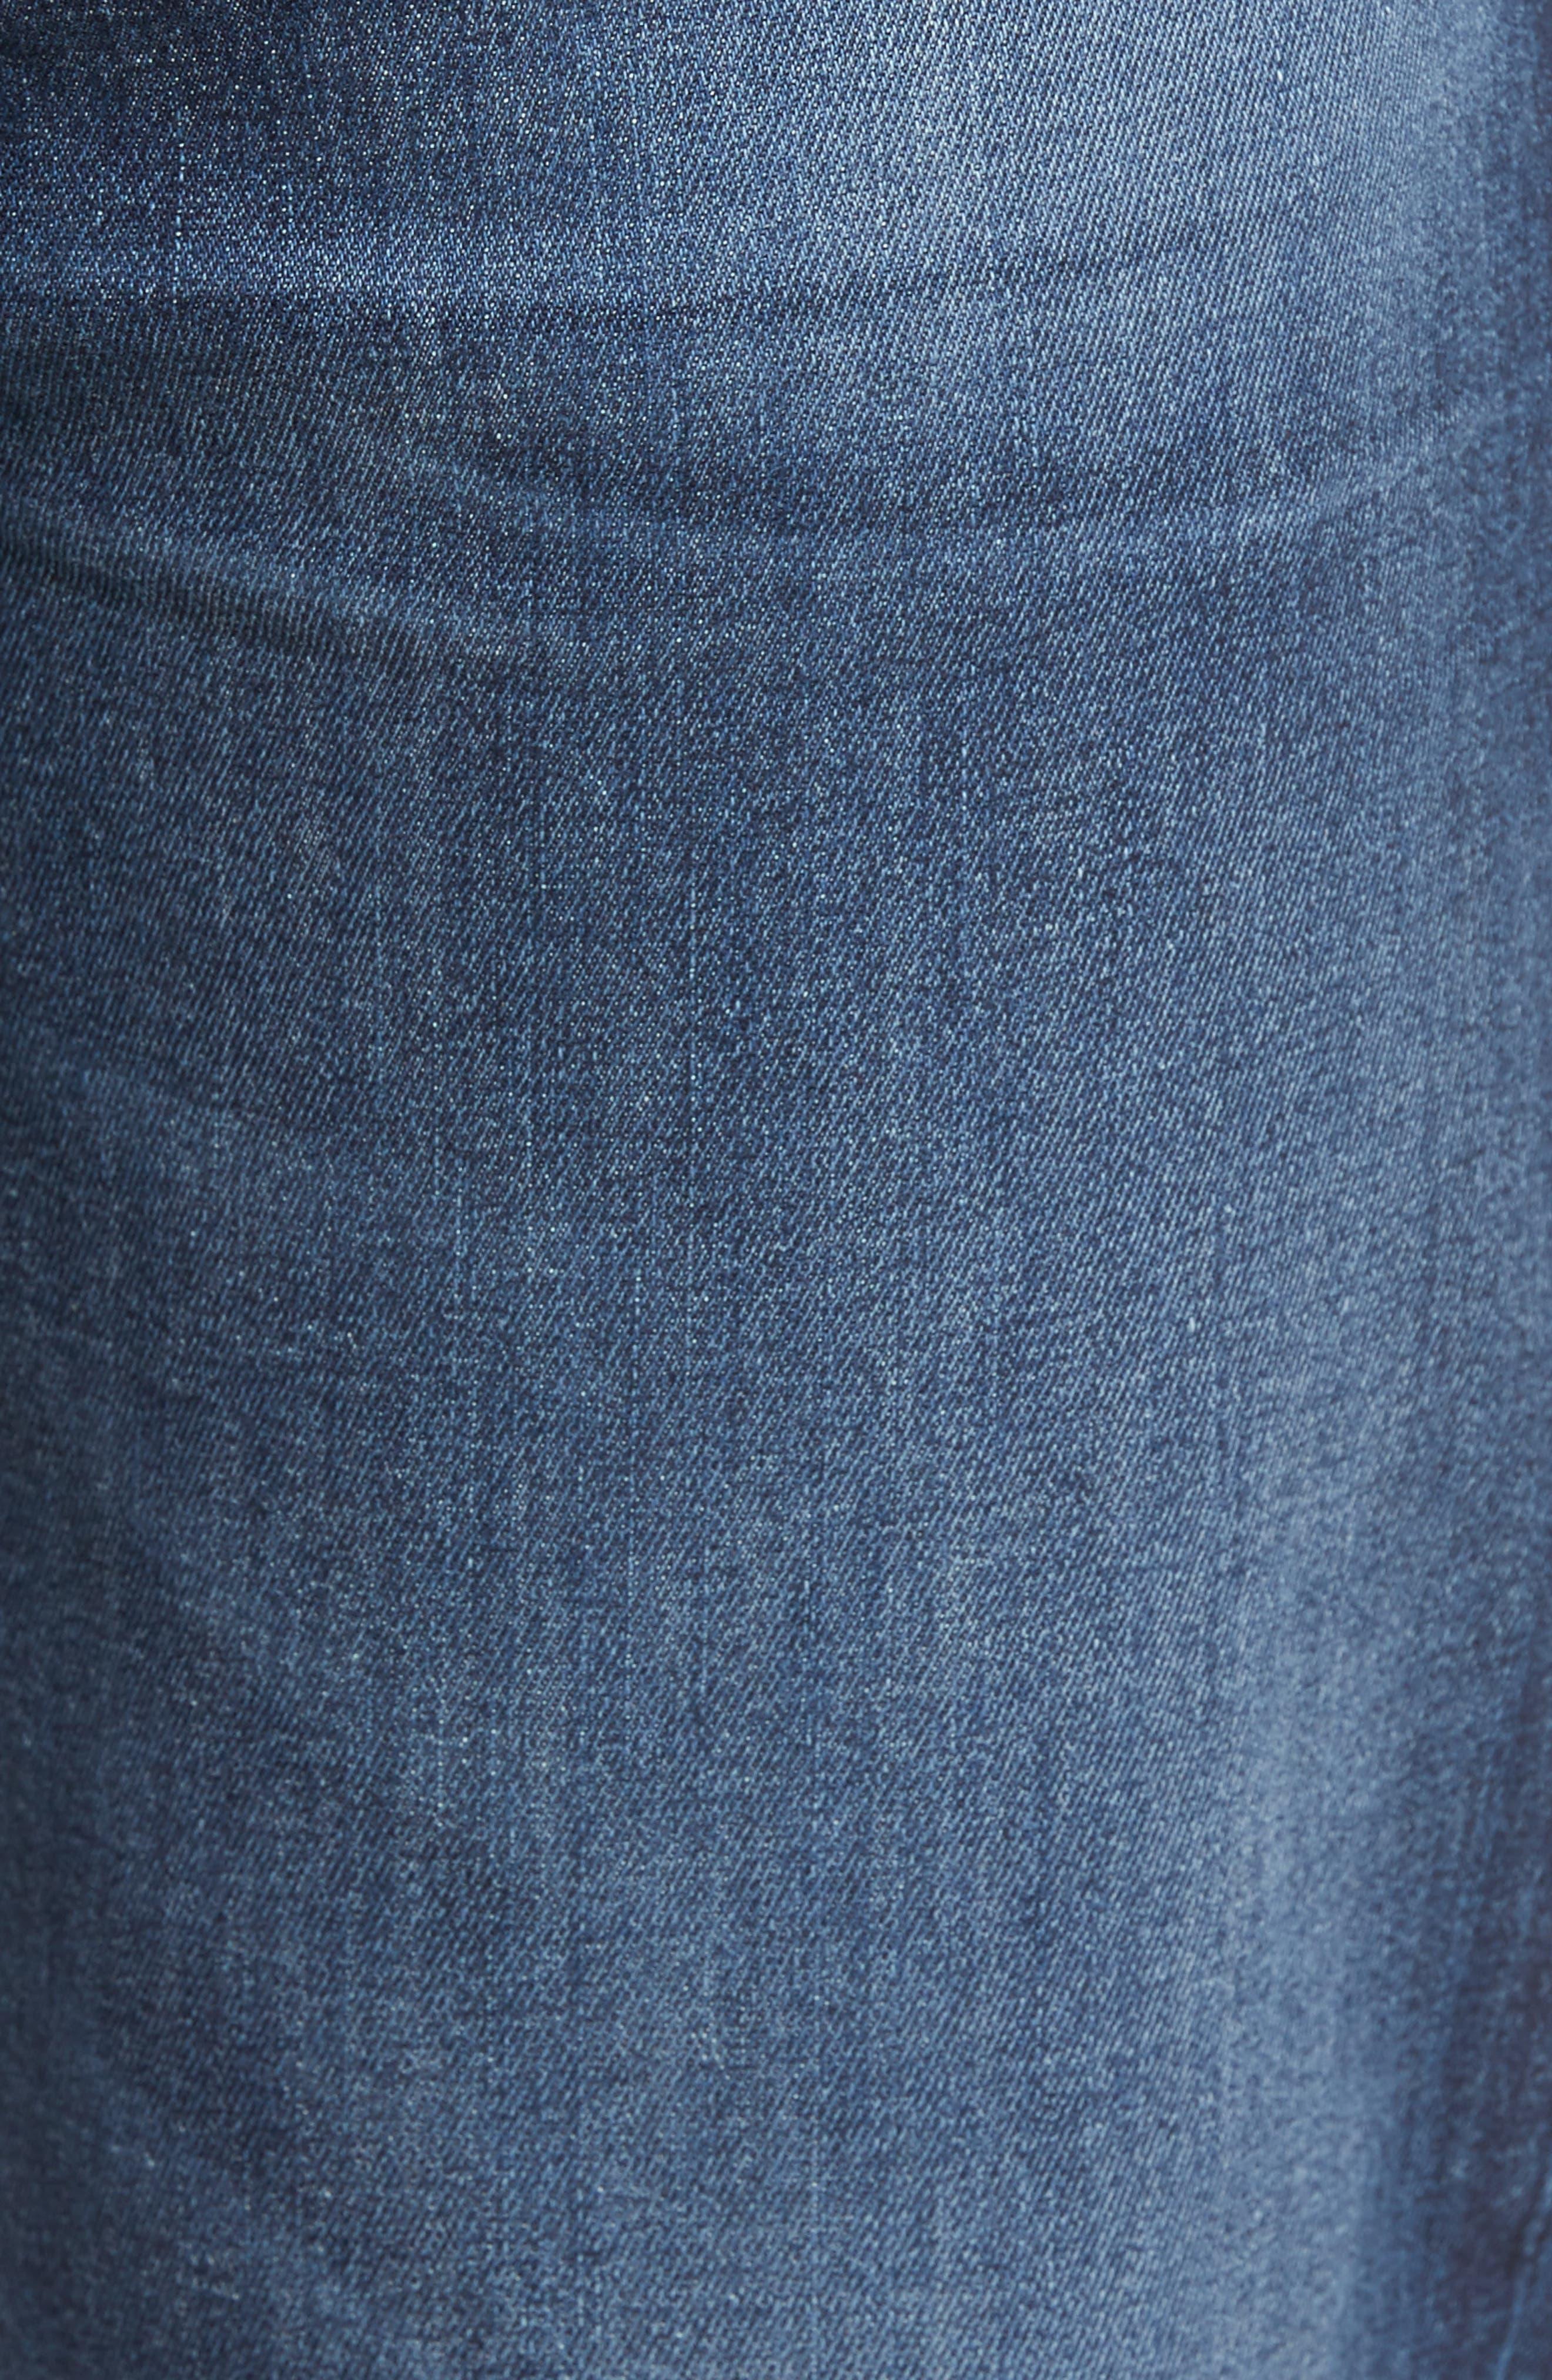 Nick Slim Fit Jeans,                             Alternate thumbnail 5, color,                             406